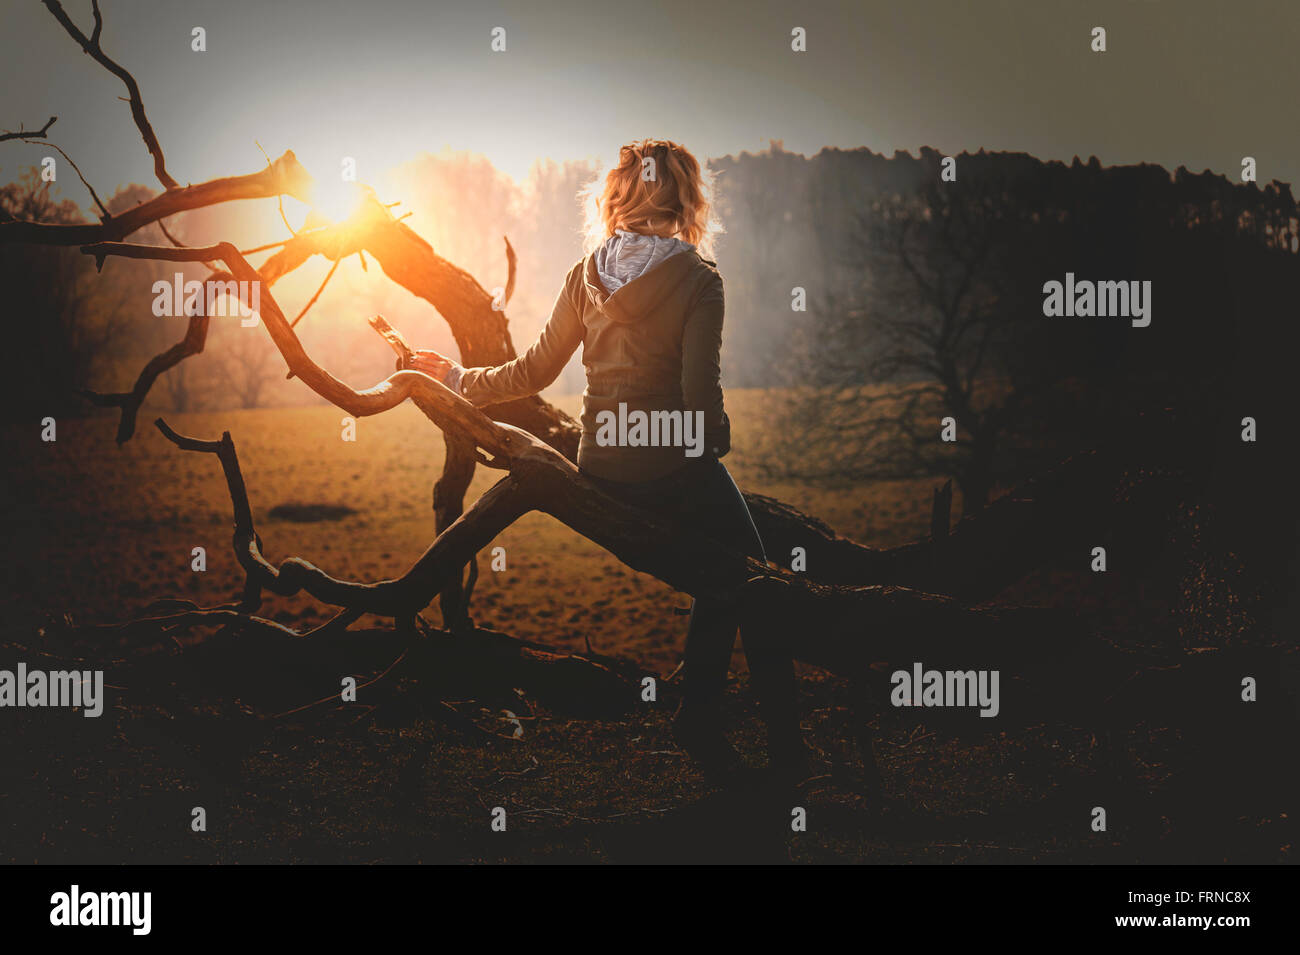 Mujer joven apoyado sobre un árbol caído en Sunset Park Imagen De Stock